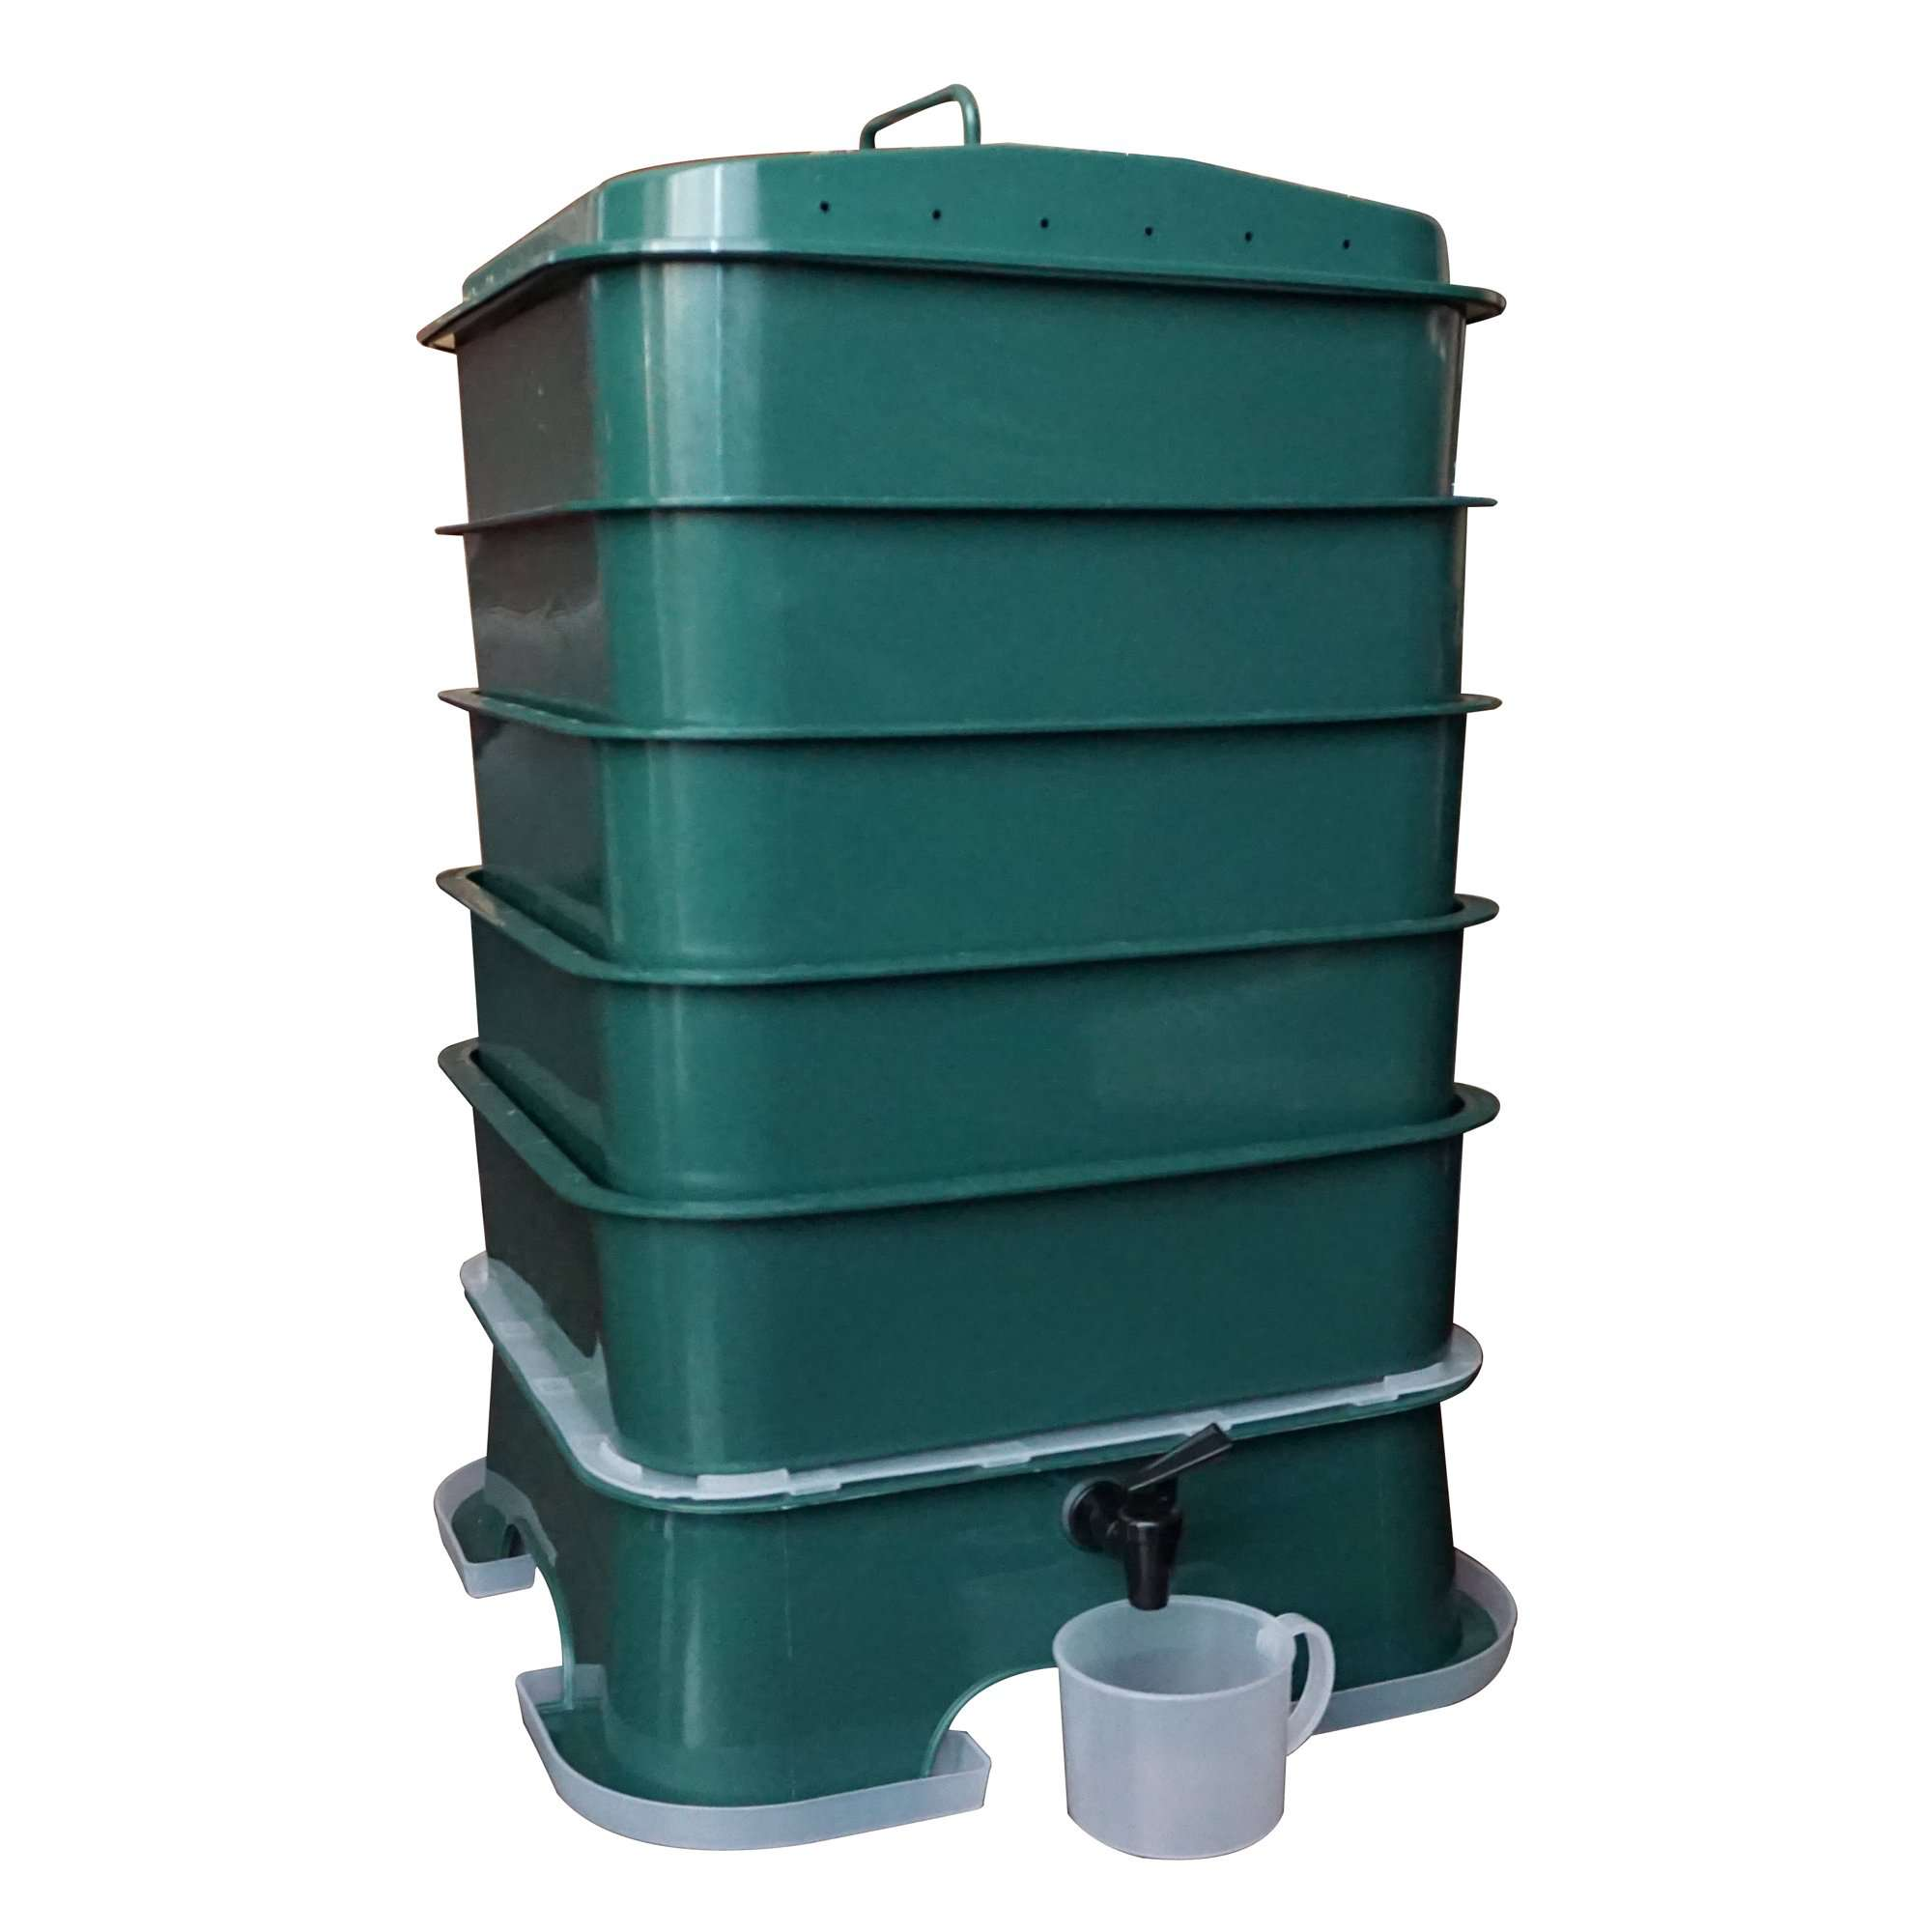 VermiHut Plus 5-Tray Worm Composter